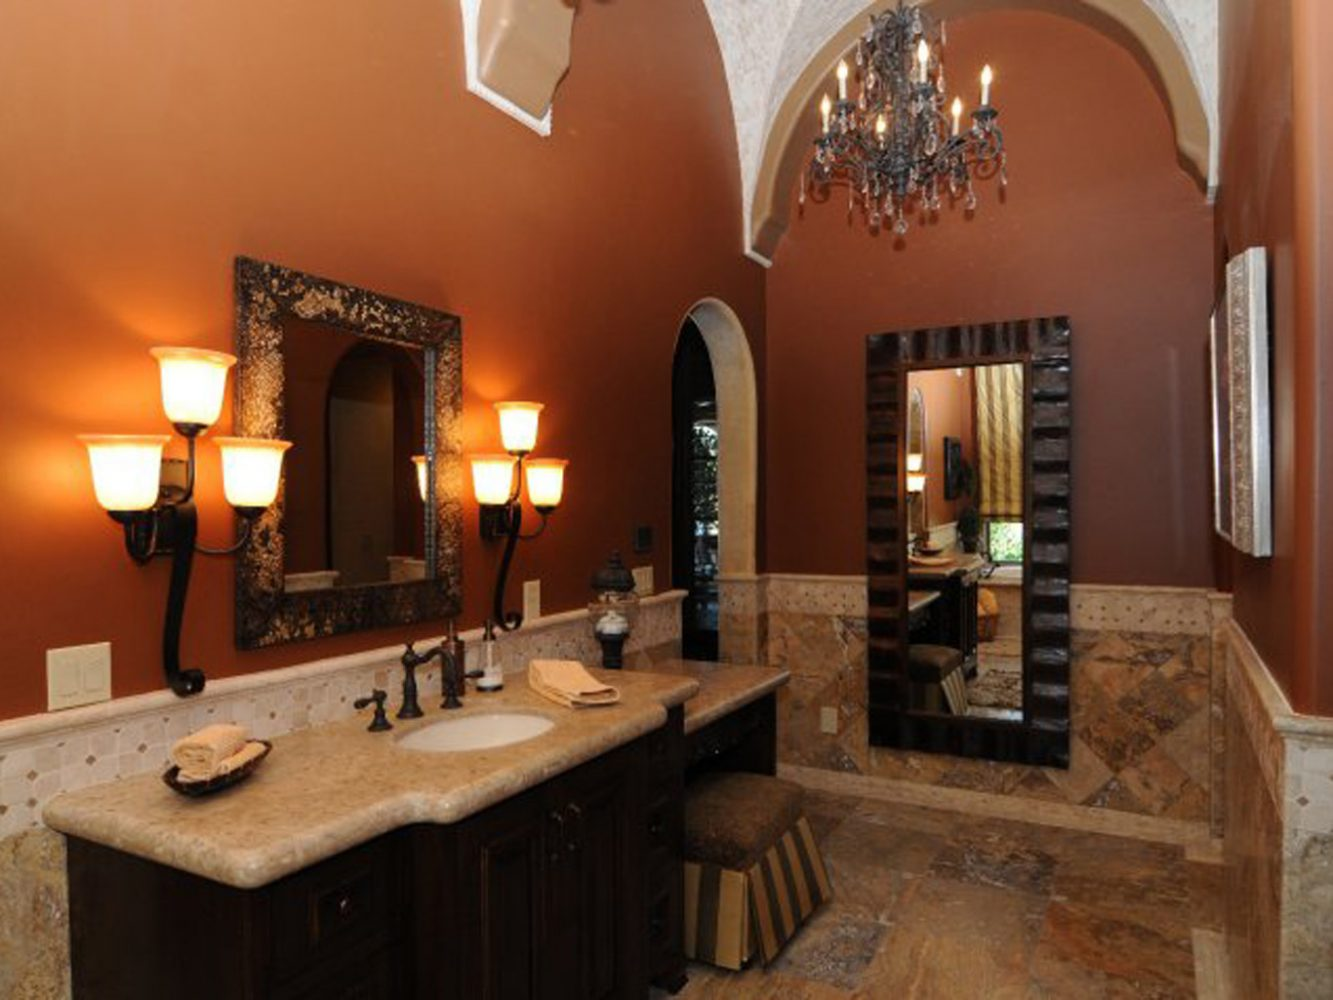 Warm Lighting Bathroom Sink